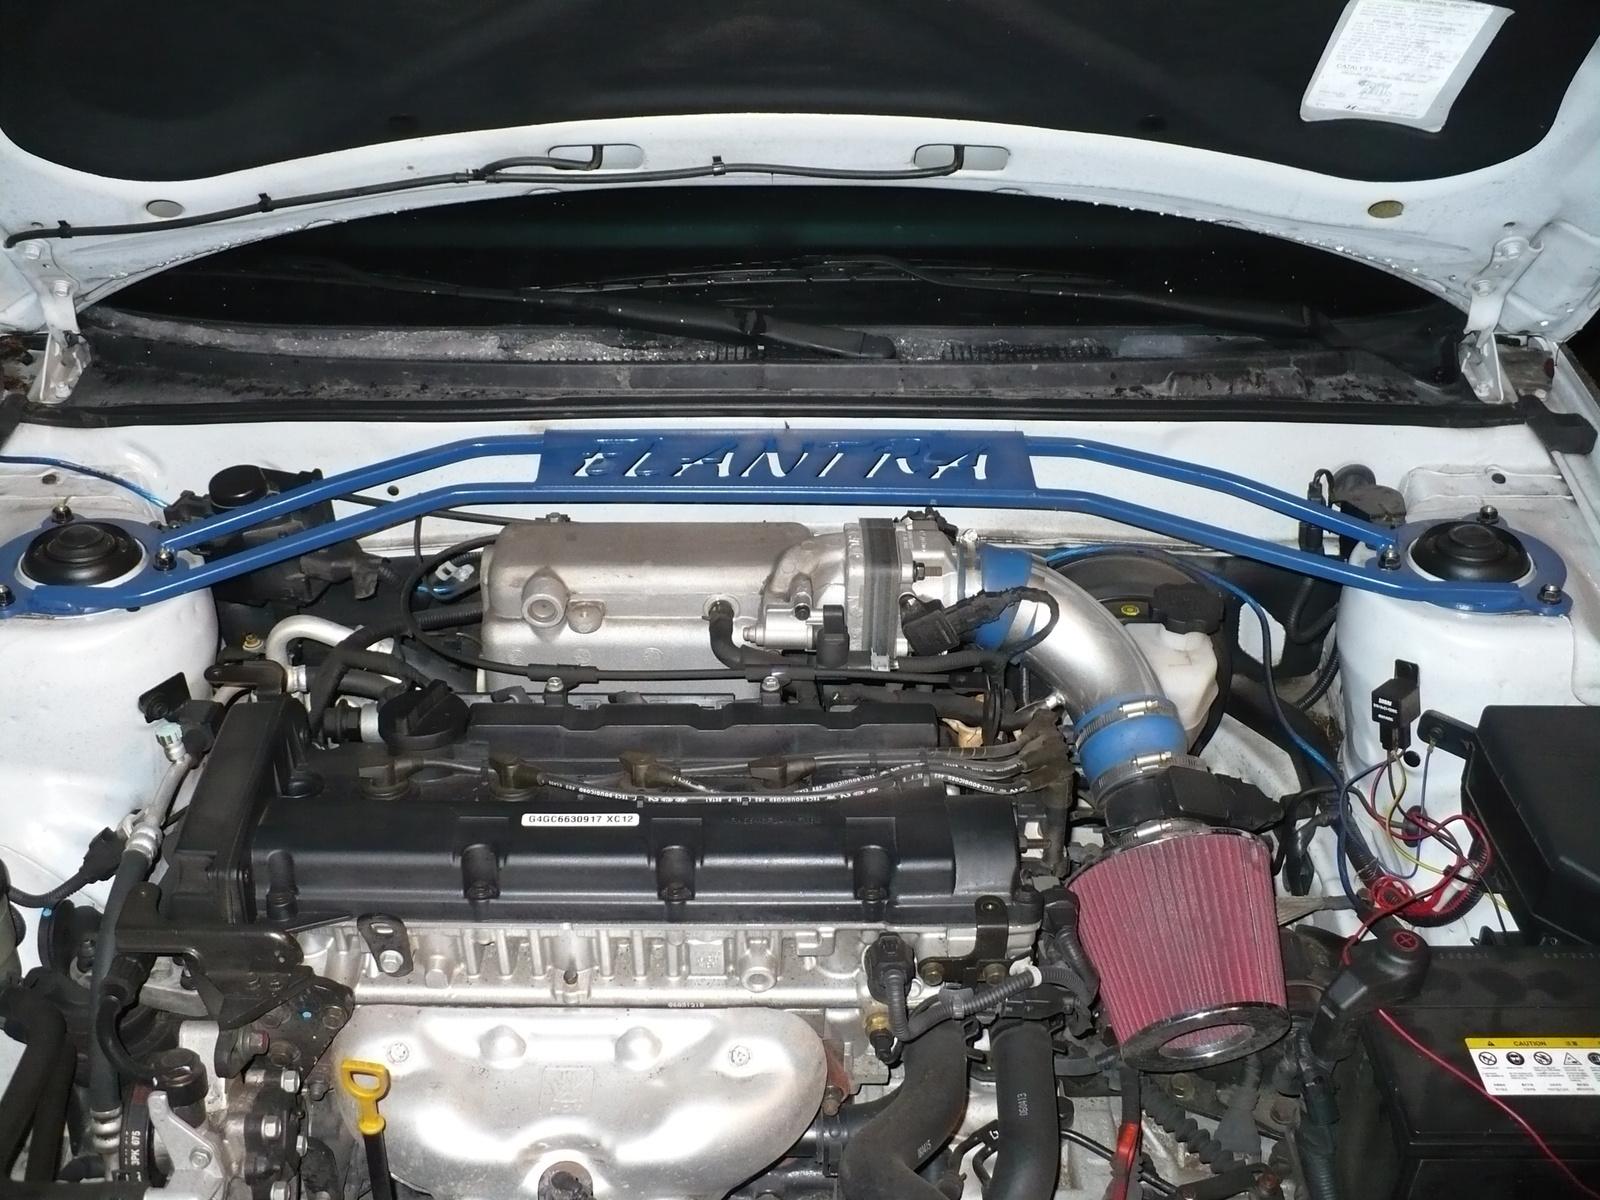 2002 hyundai elantra engine diagram honda crx radio wiring 2013